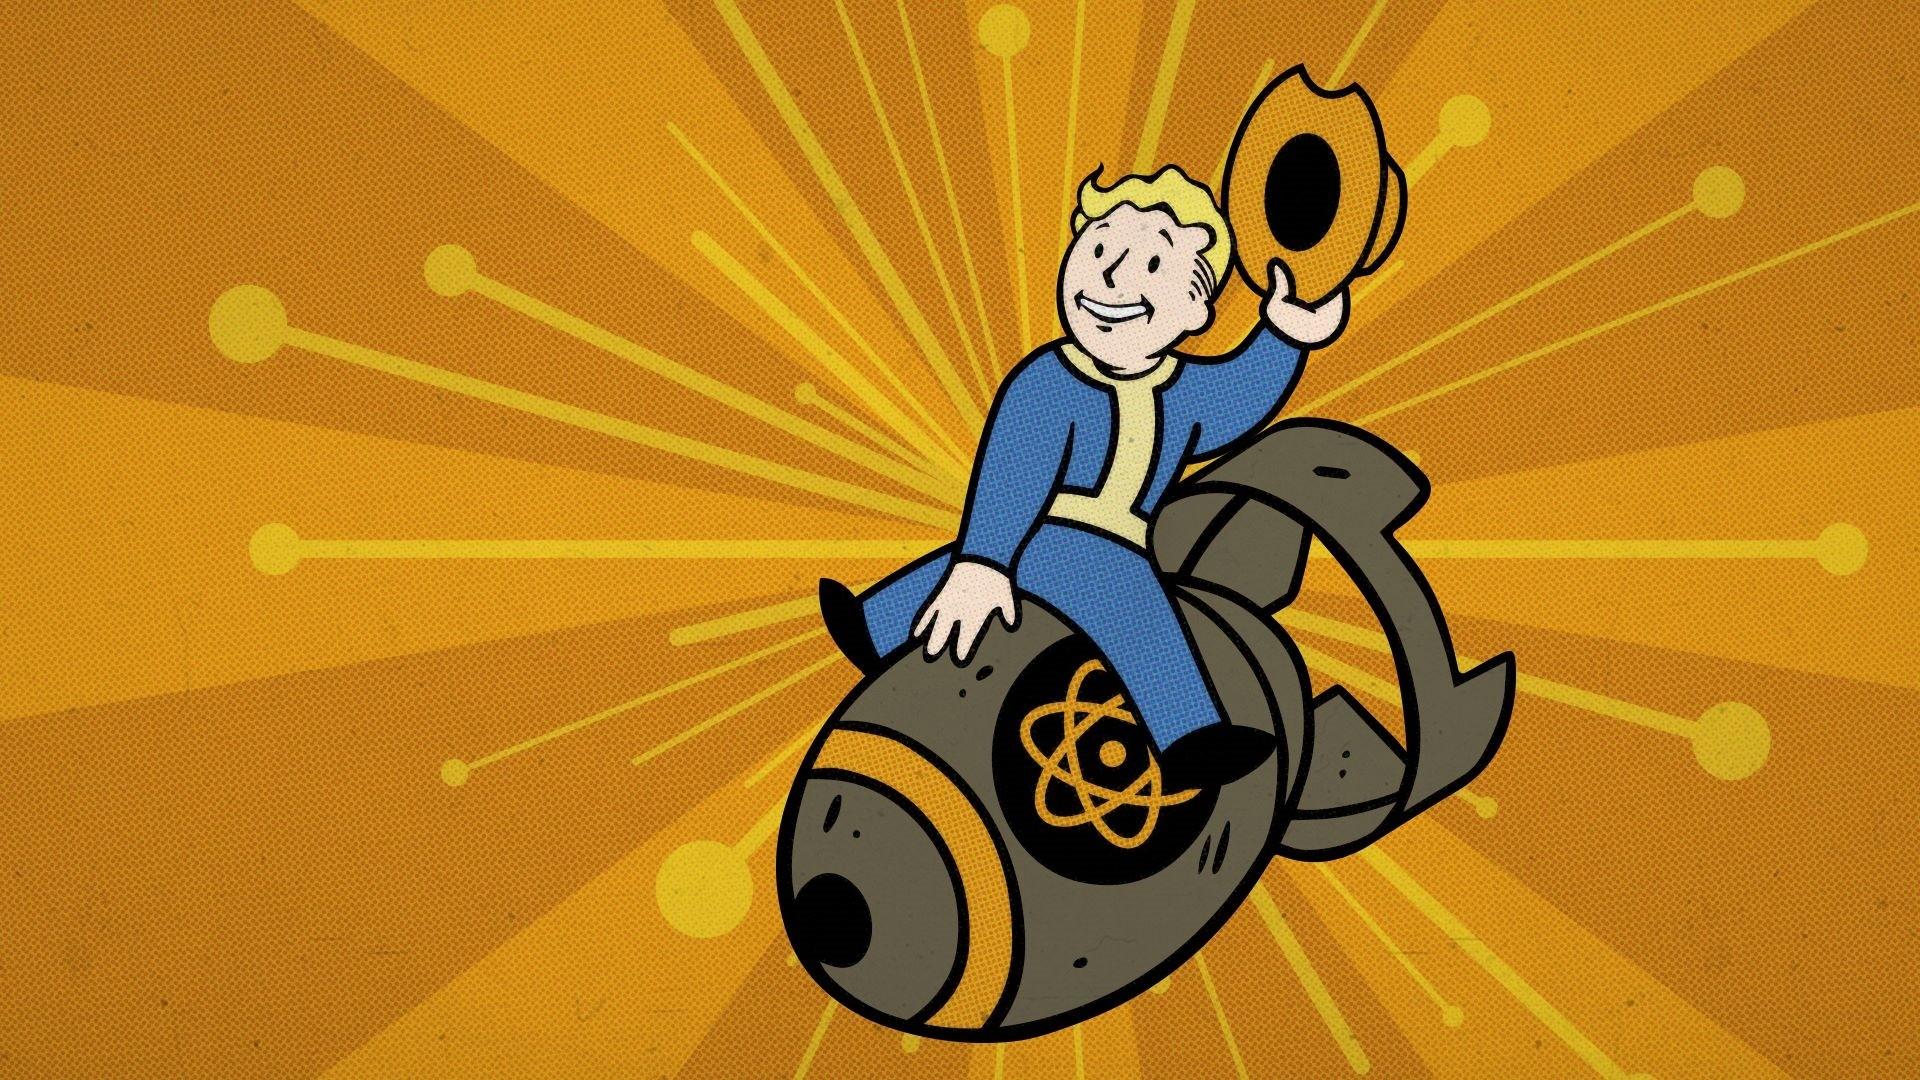 Fallout 76 Wallpaper image hd